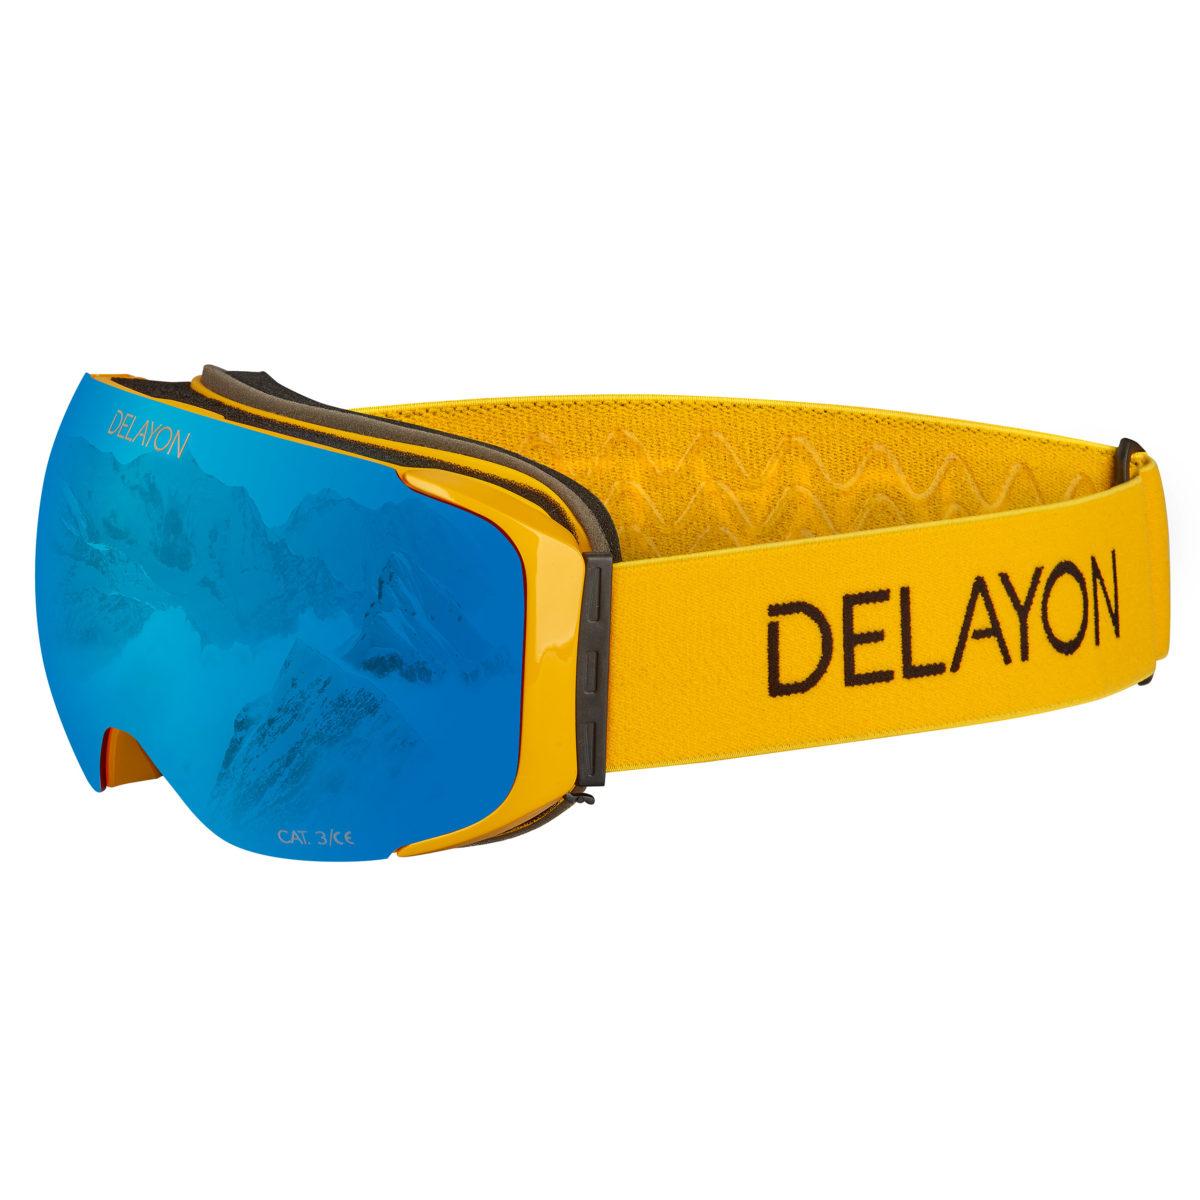 DELAYON Eyewear Explorer Goggle Space Blue Hornet Yellow